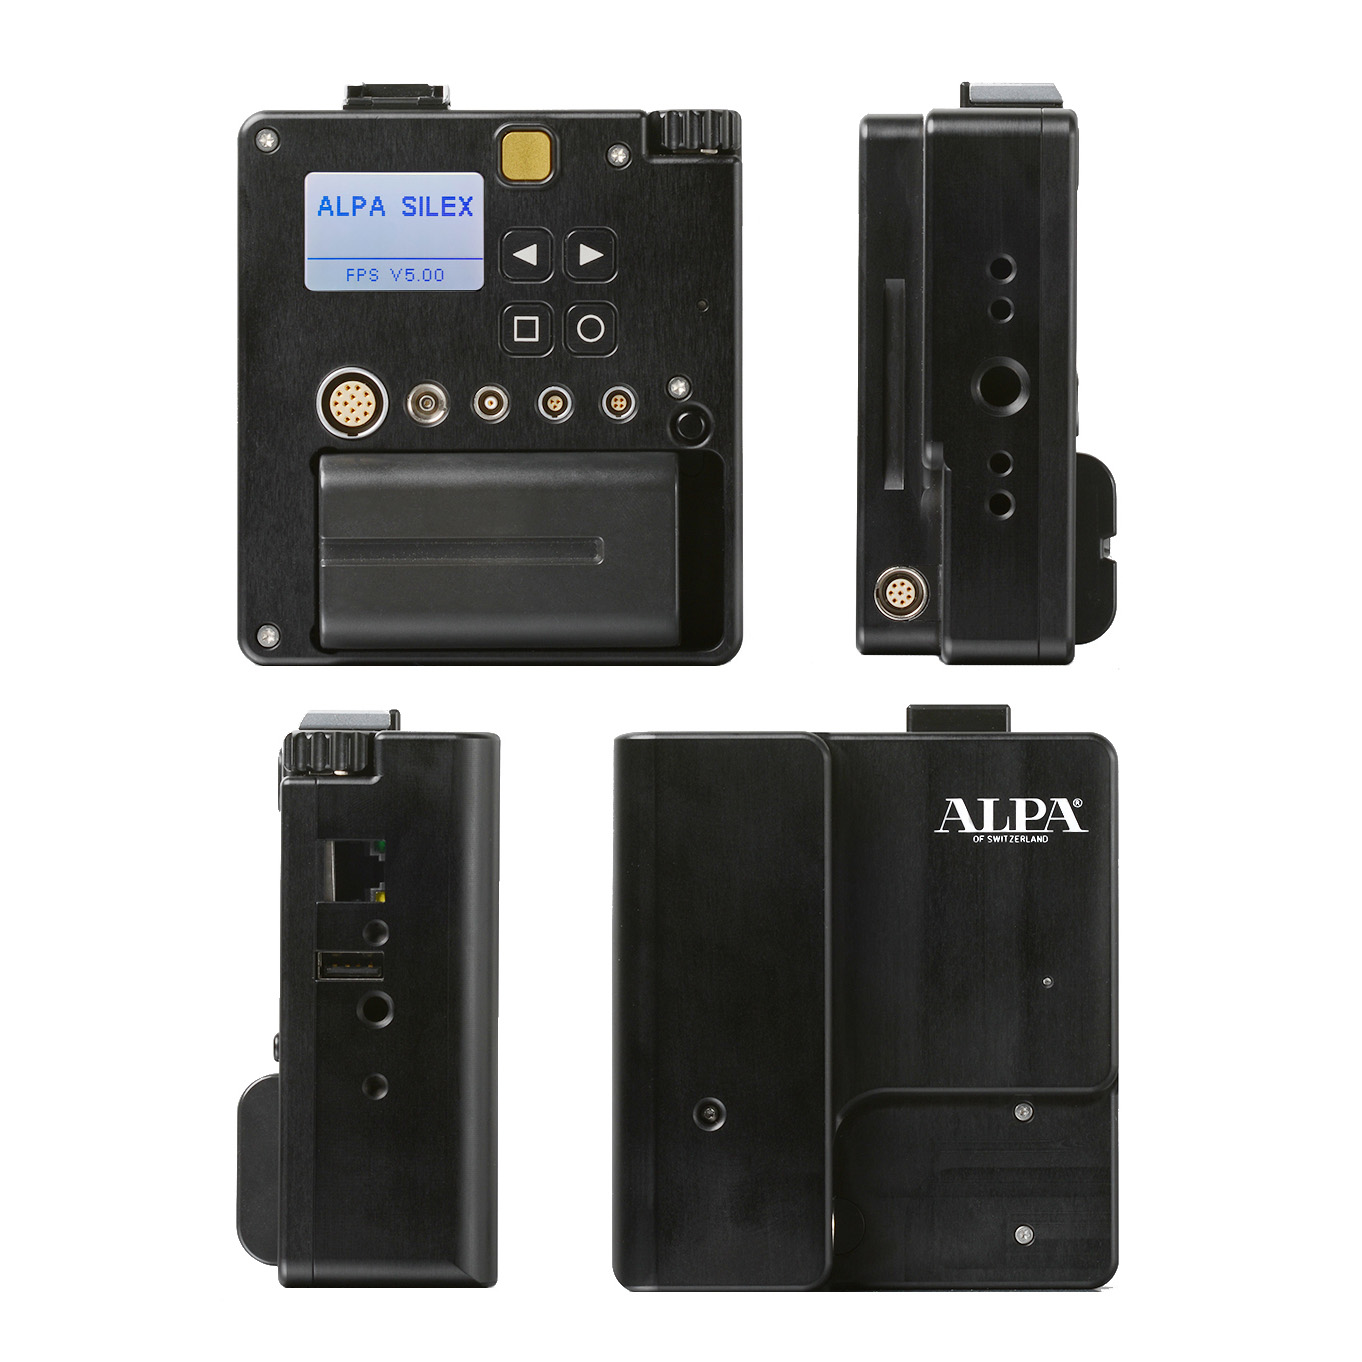 ALPA SILEX Mk II control unit